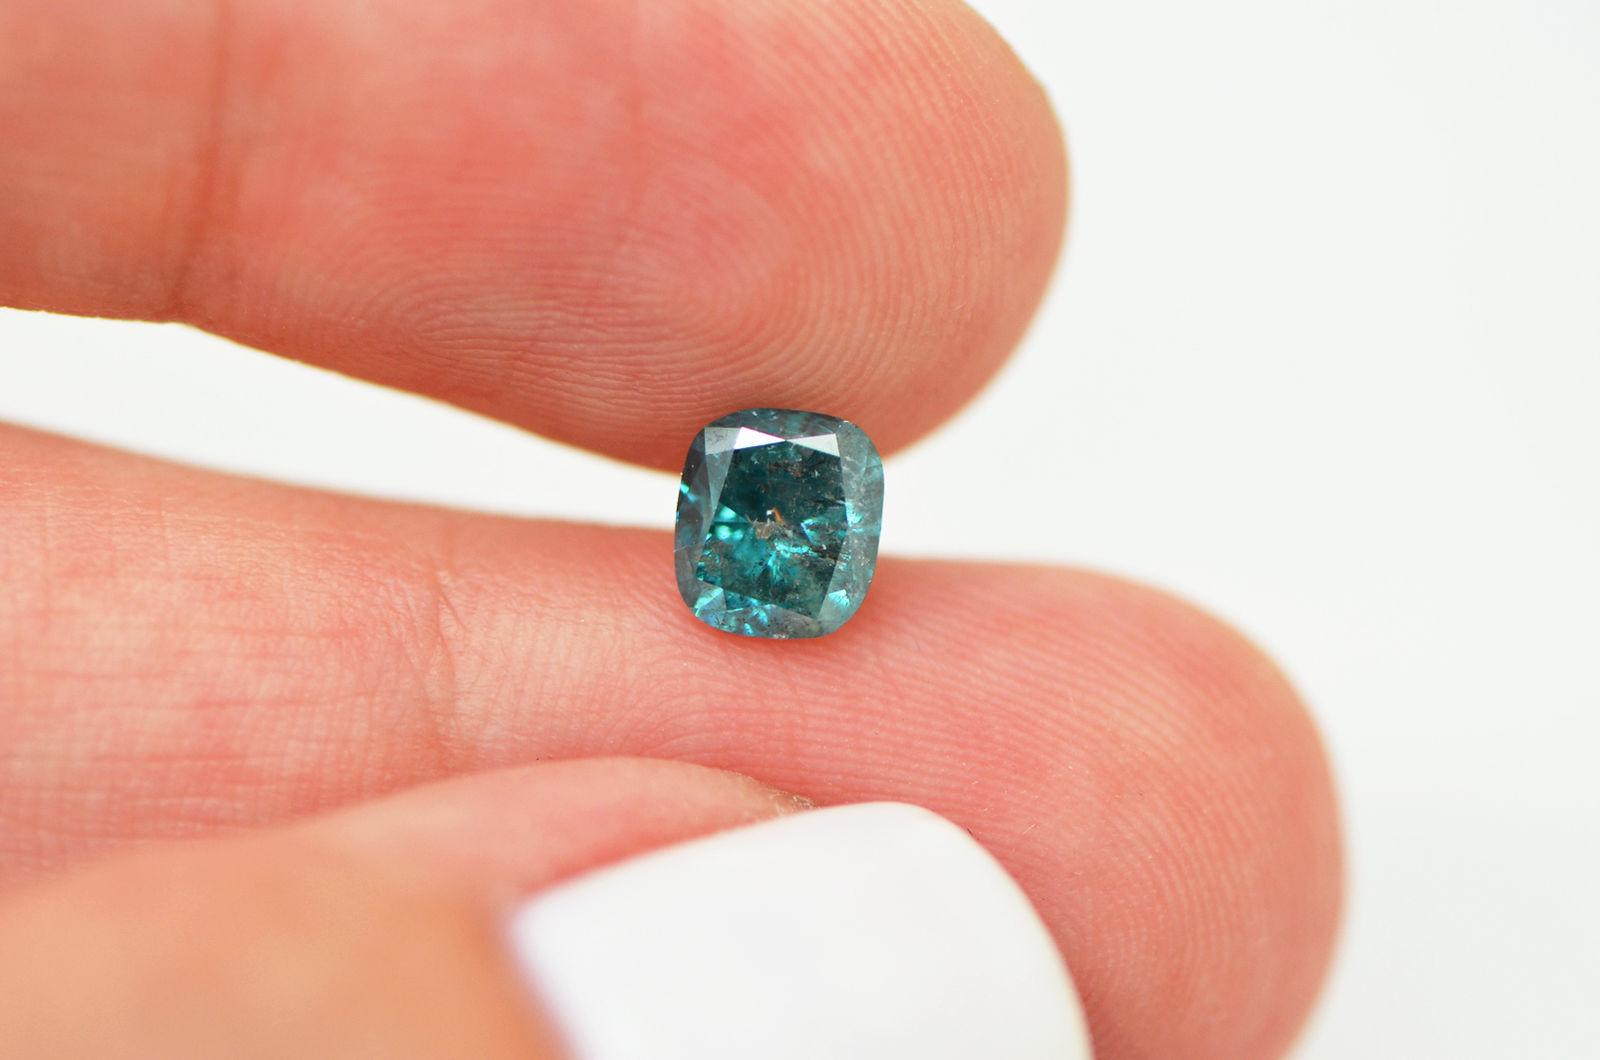 1 Ct Loose Diamond Real Fancy Blue Cushion Enhanced I1